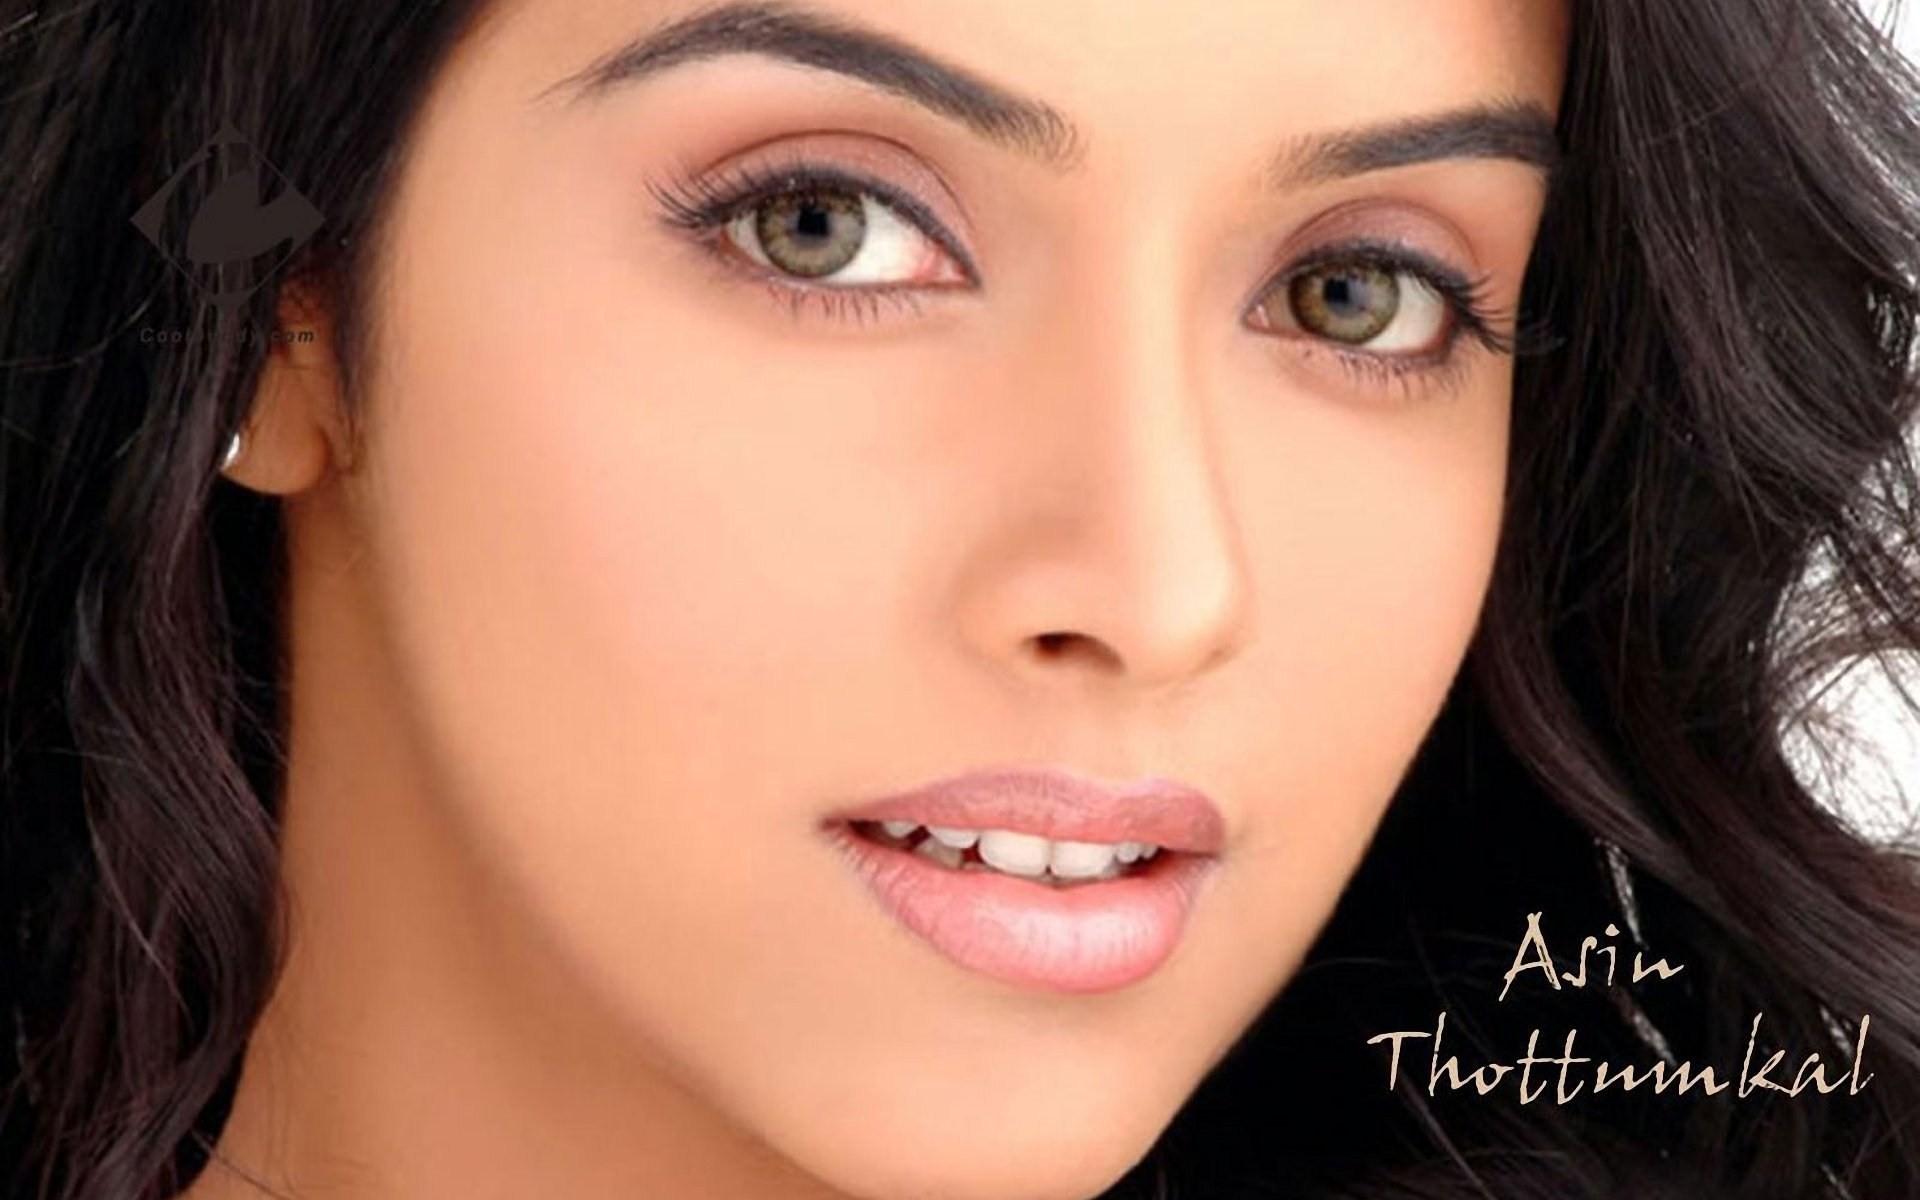 beautiful face of asin thottumkal asin beautiful 1563229 hd wallpaper backgrounds download asin thottumkal asin beautiful